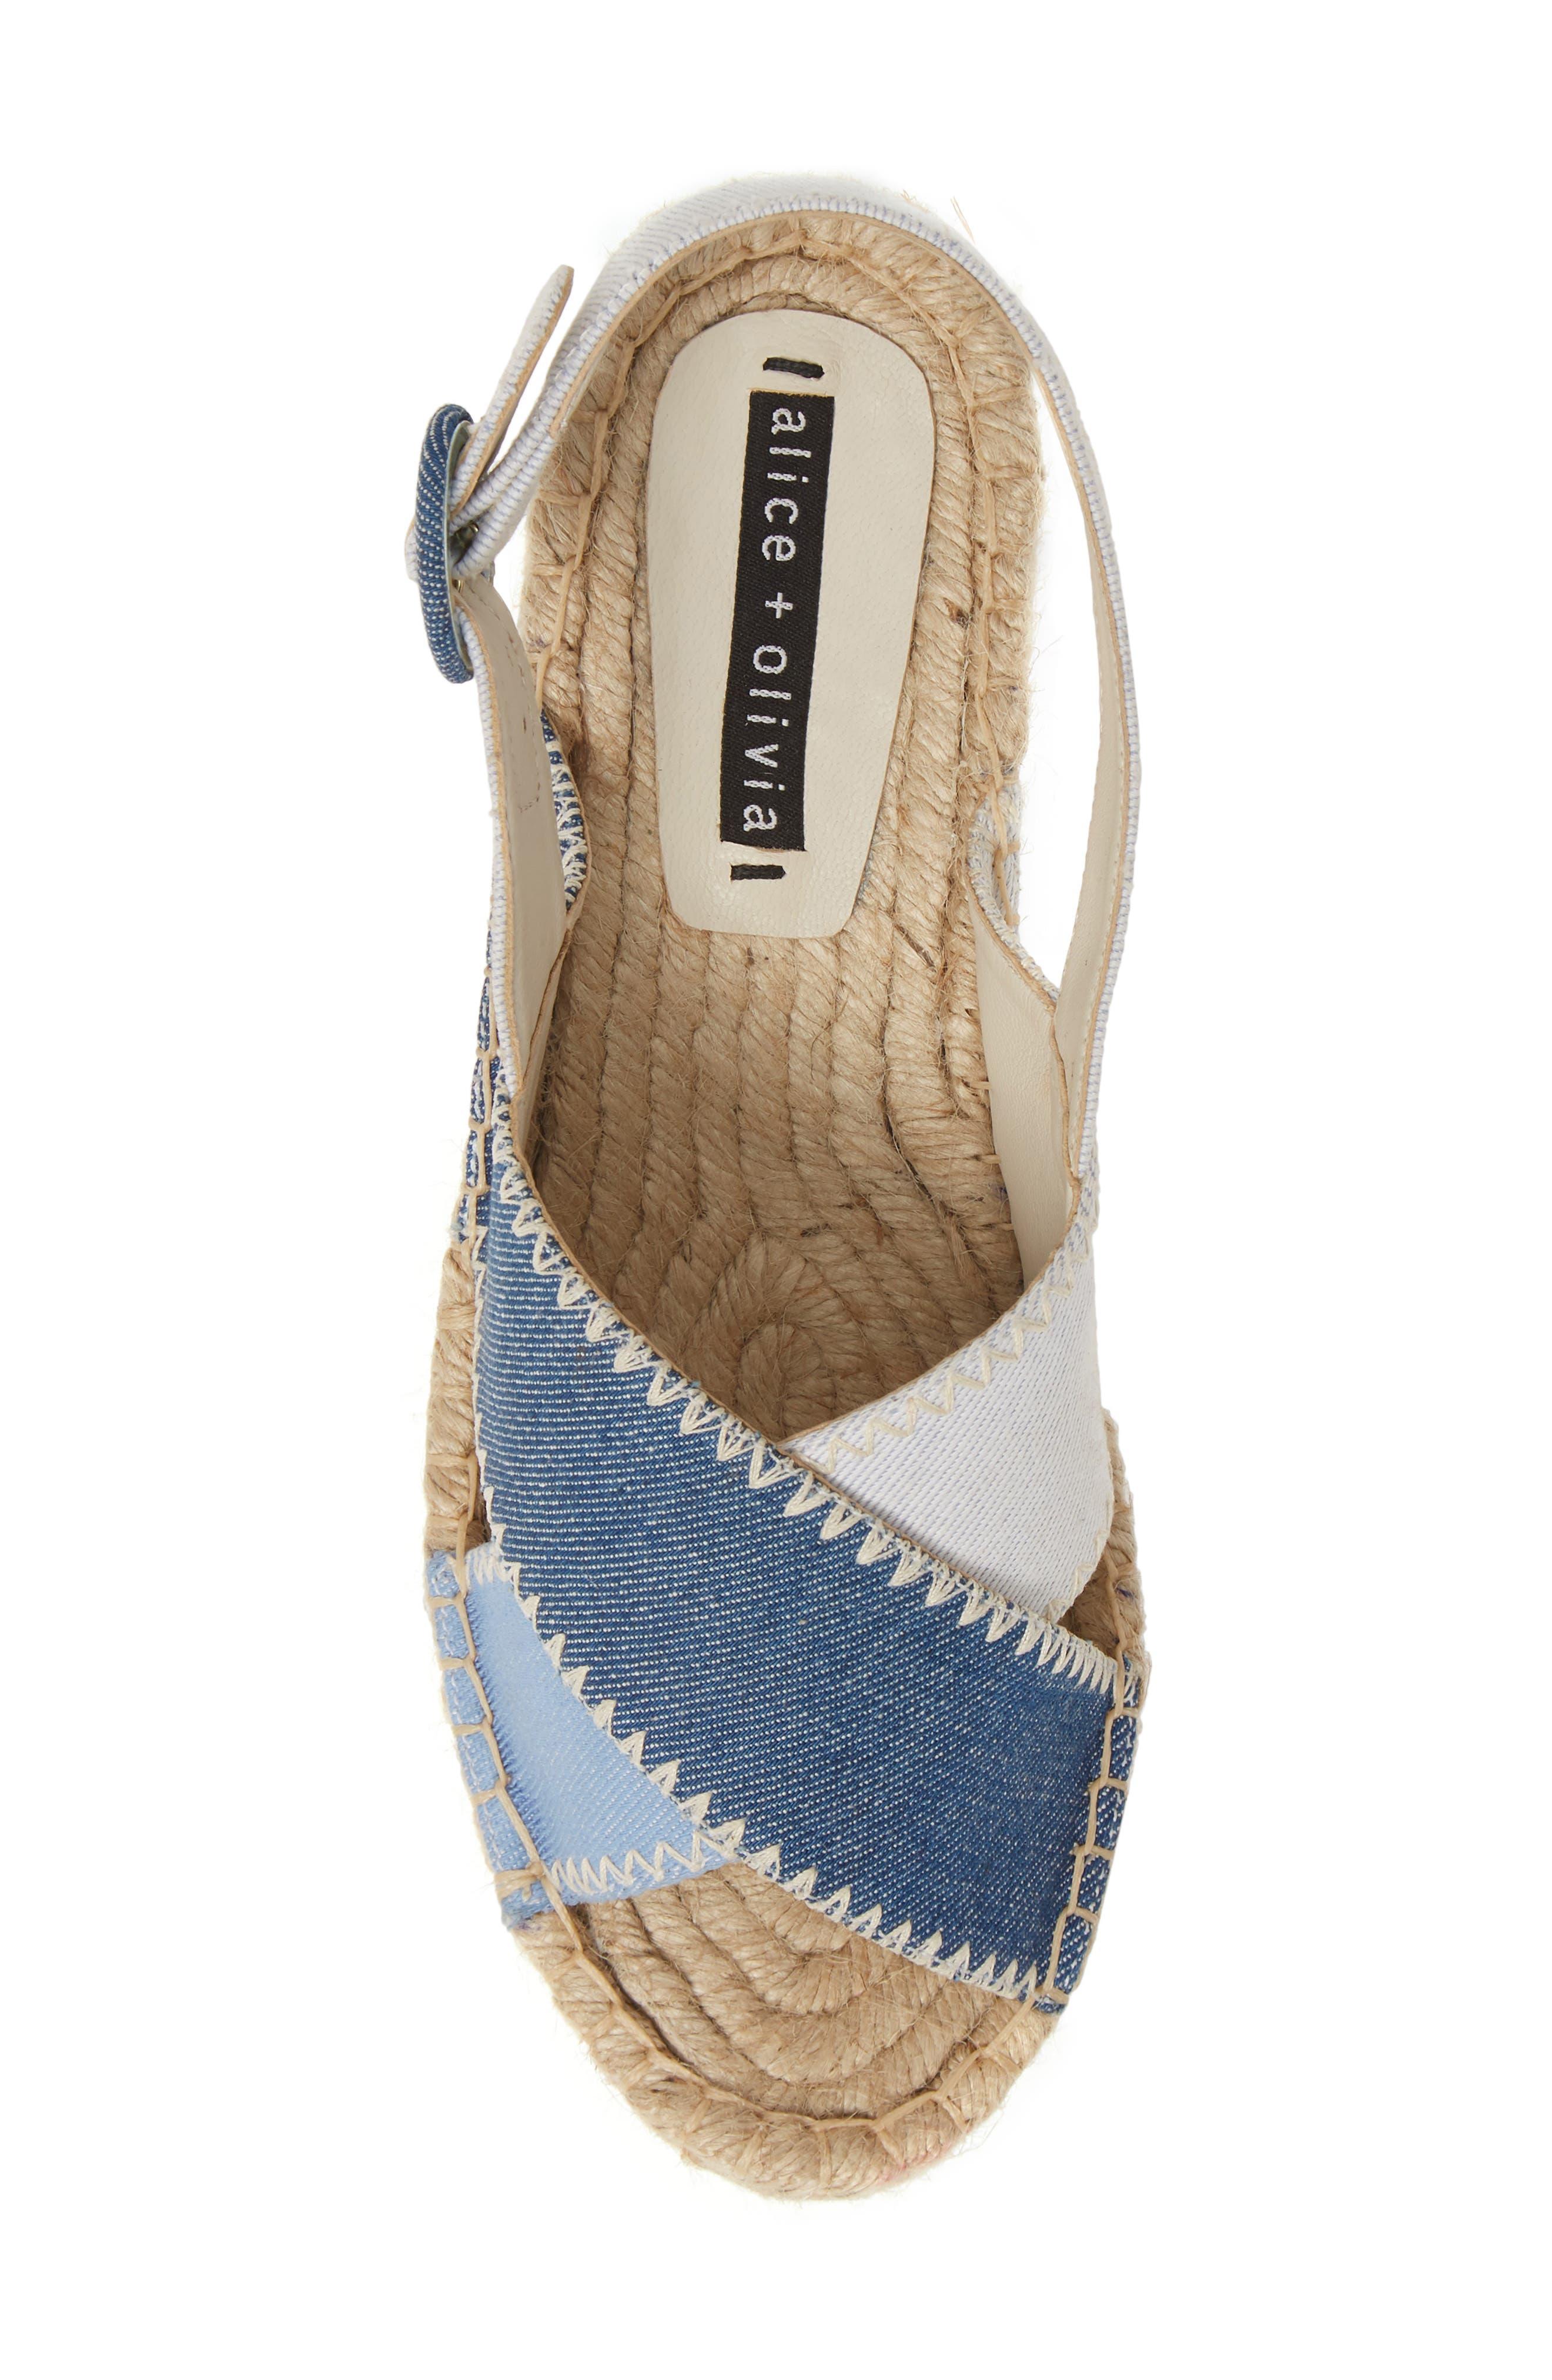 ALICE + OLIVIA, Fayen Platform Sandal, Alternate thumbnail 5, color, DARK BLUE/ LIGHT BLUE/ IVORY